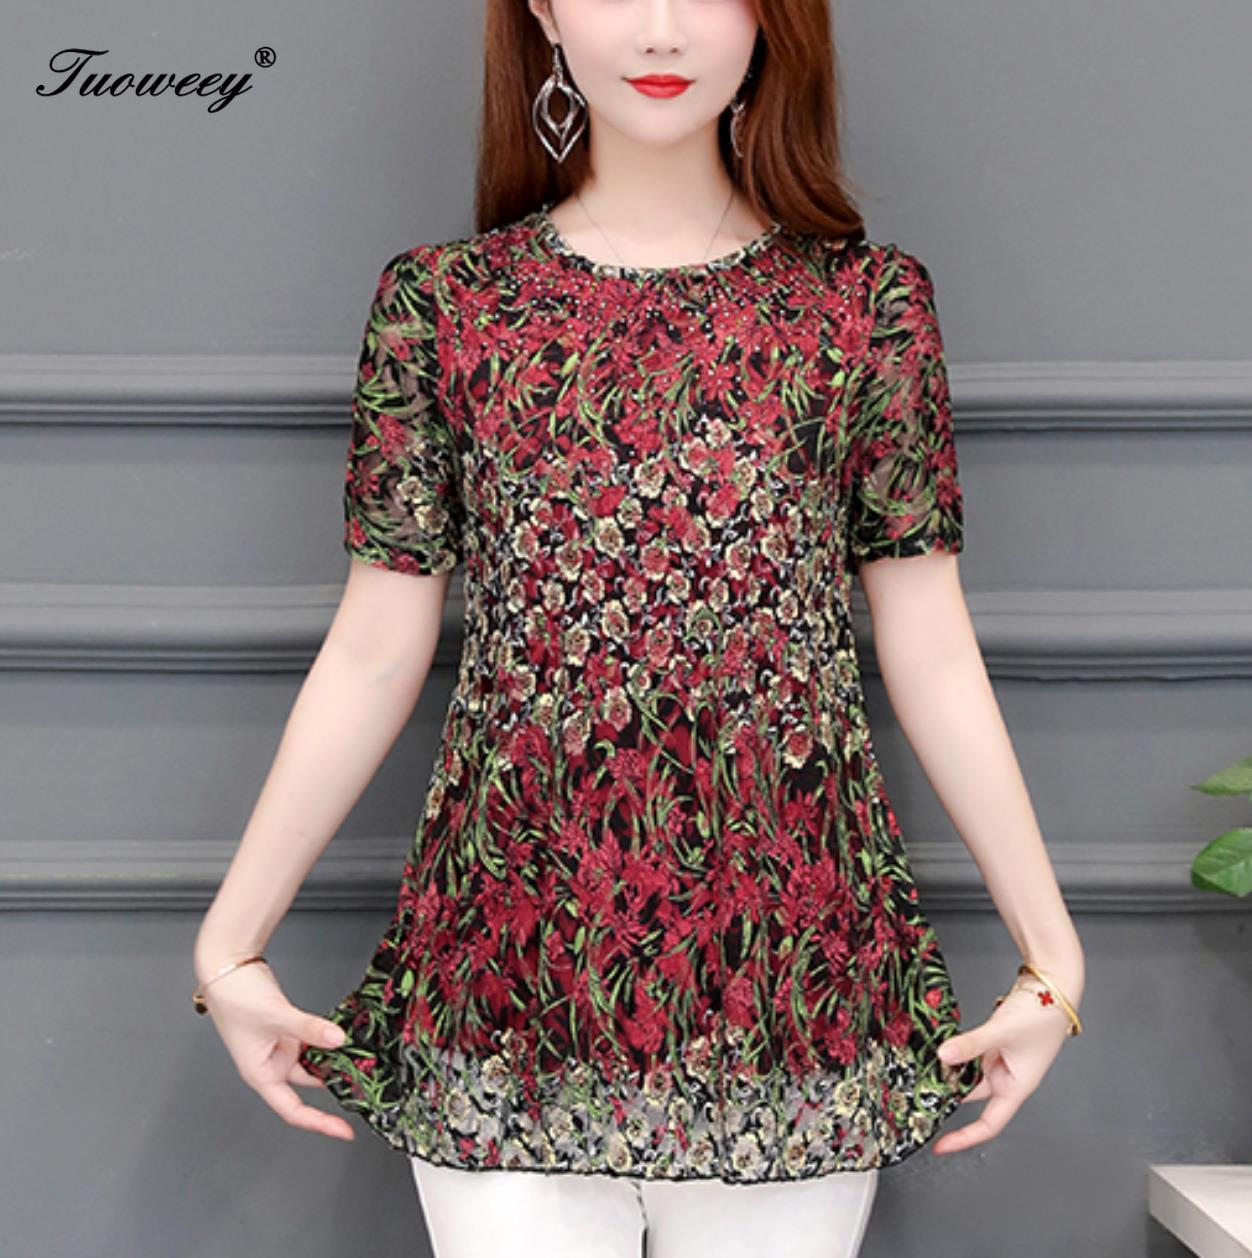 Blusas mujer de moda 2020 estampado floral chiffon blusa mujer tops camisas mujer chemisier femme tops y blusas para mujer